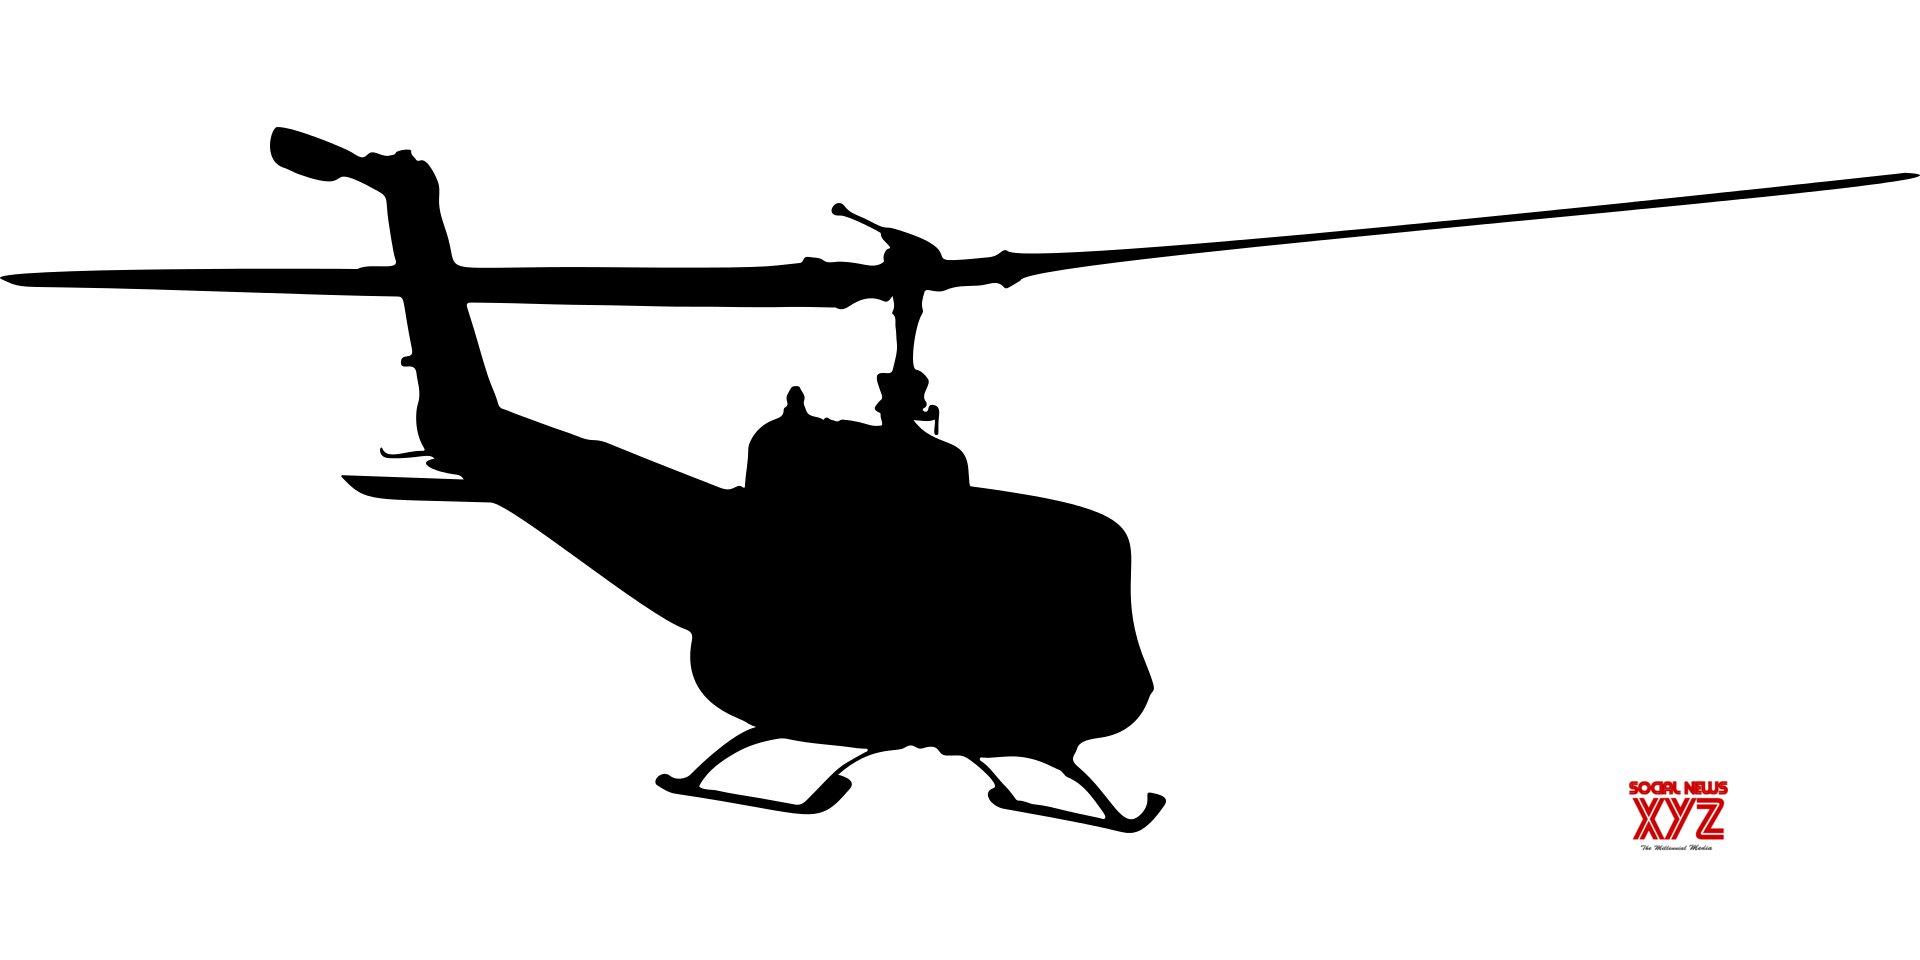 Myanmar's Kachin rebels shoot down military helicopter